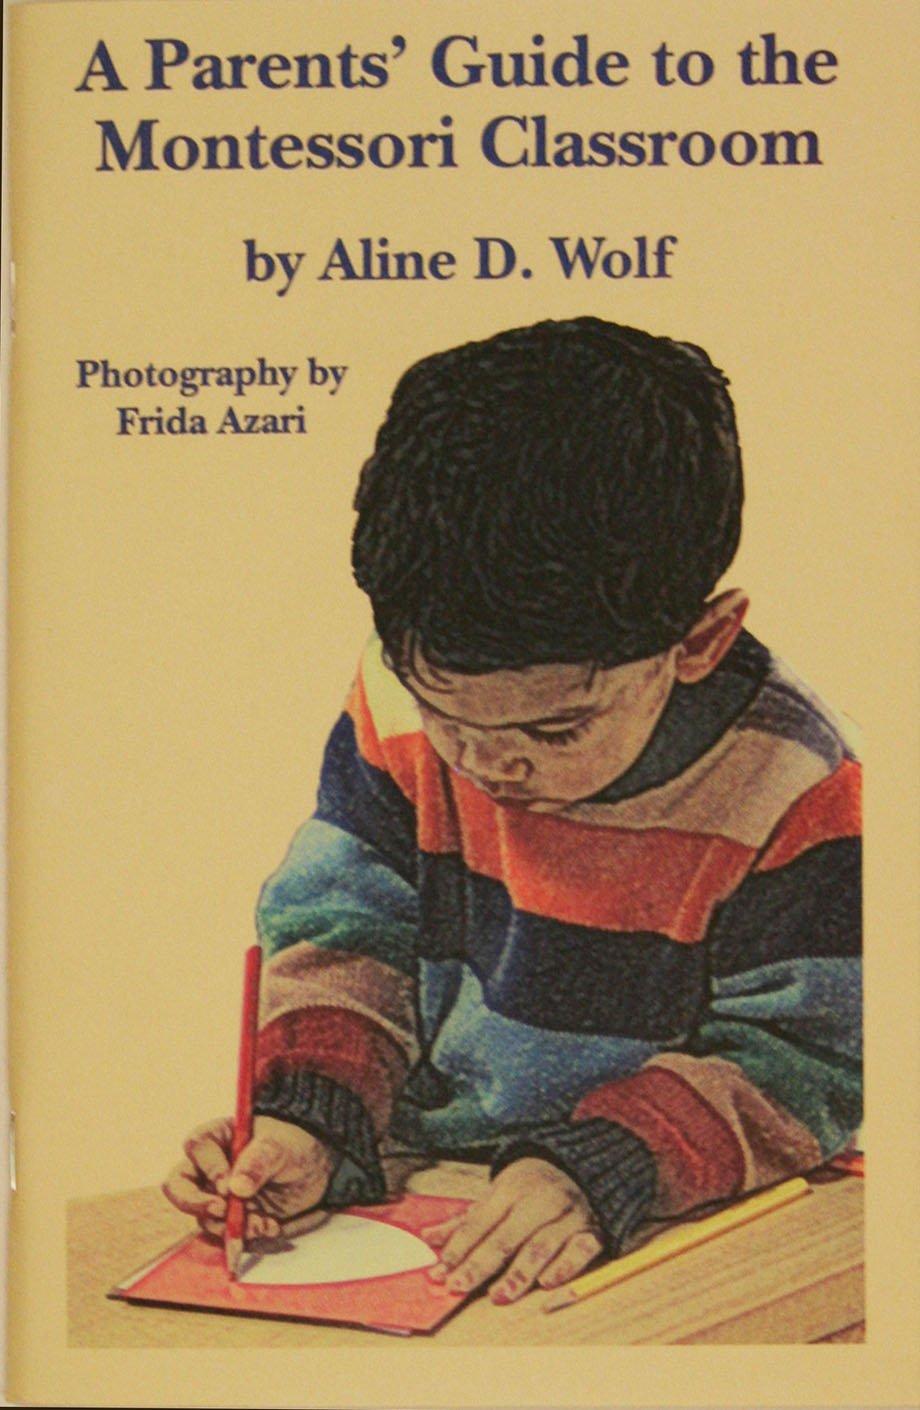 A Parents Guide to the Montessori Classroom: Aline D. Wolf, Photography by  Frida Azari: 9780939195404: Amazon.com: Books